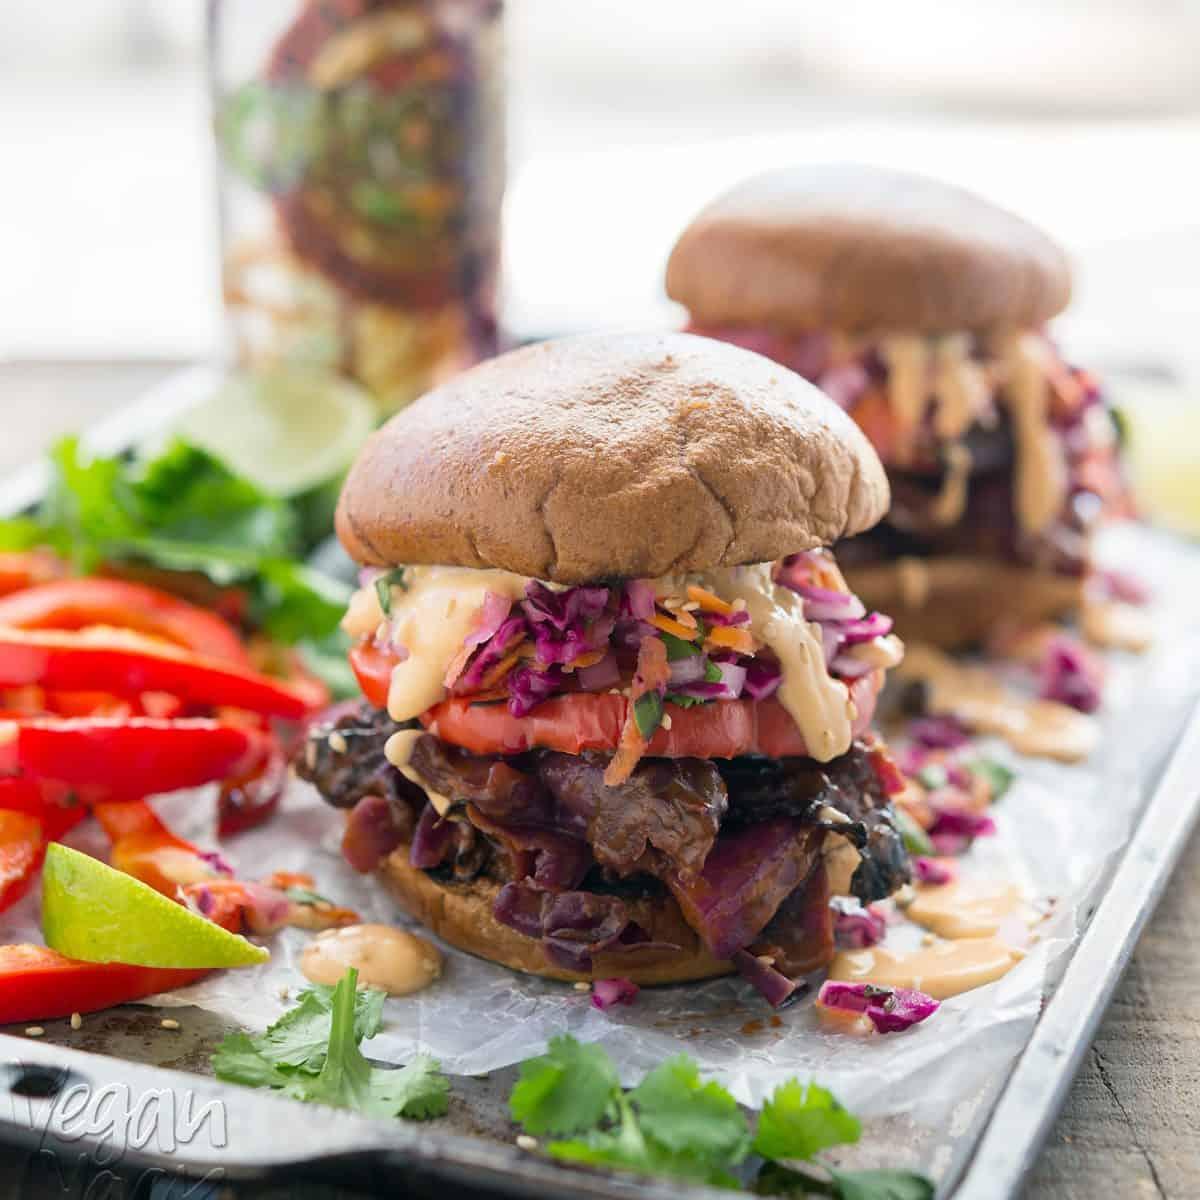 Thai BBQ Beer Cabbage Sandwiches with Daikon Slaw and Spicy Aioli. A fun twist on summer BBQ! #vegan